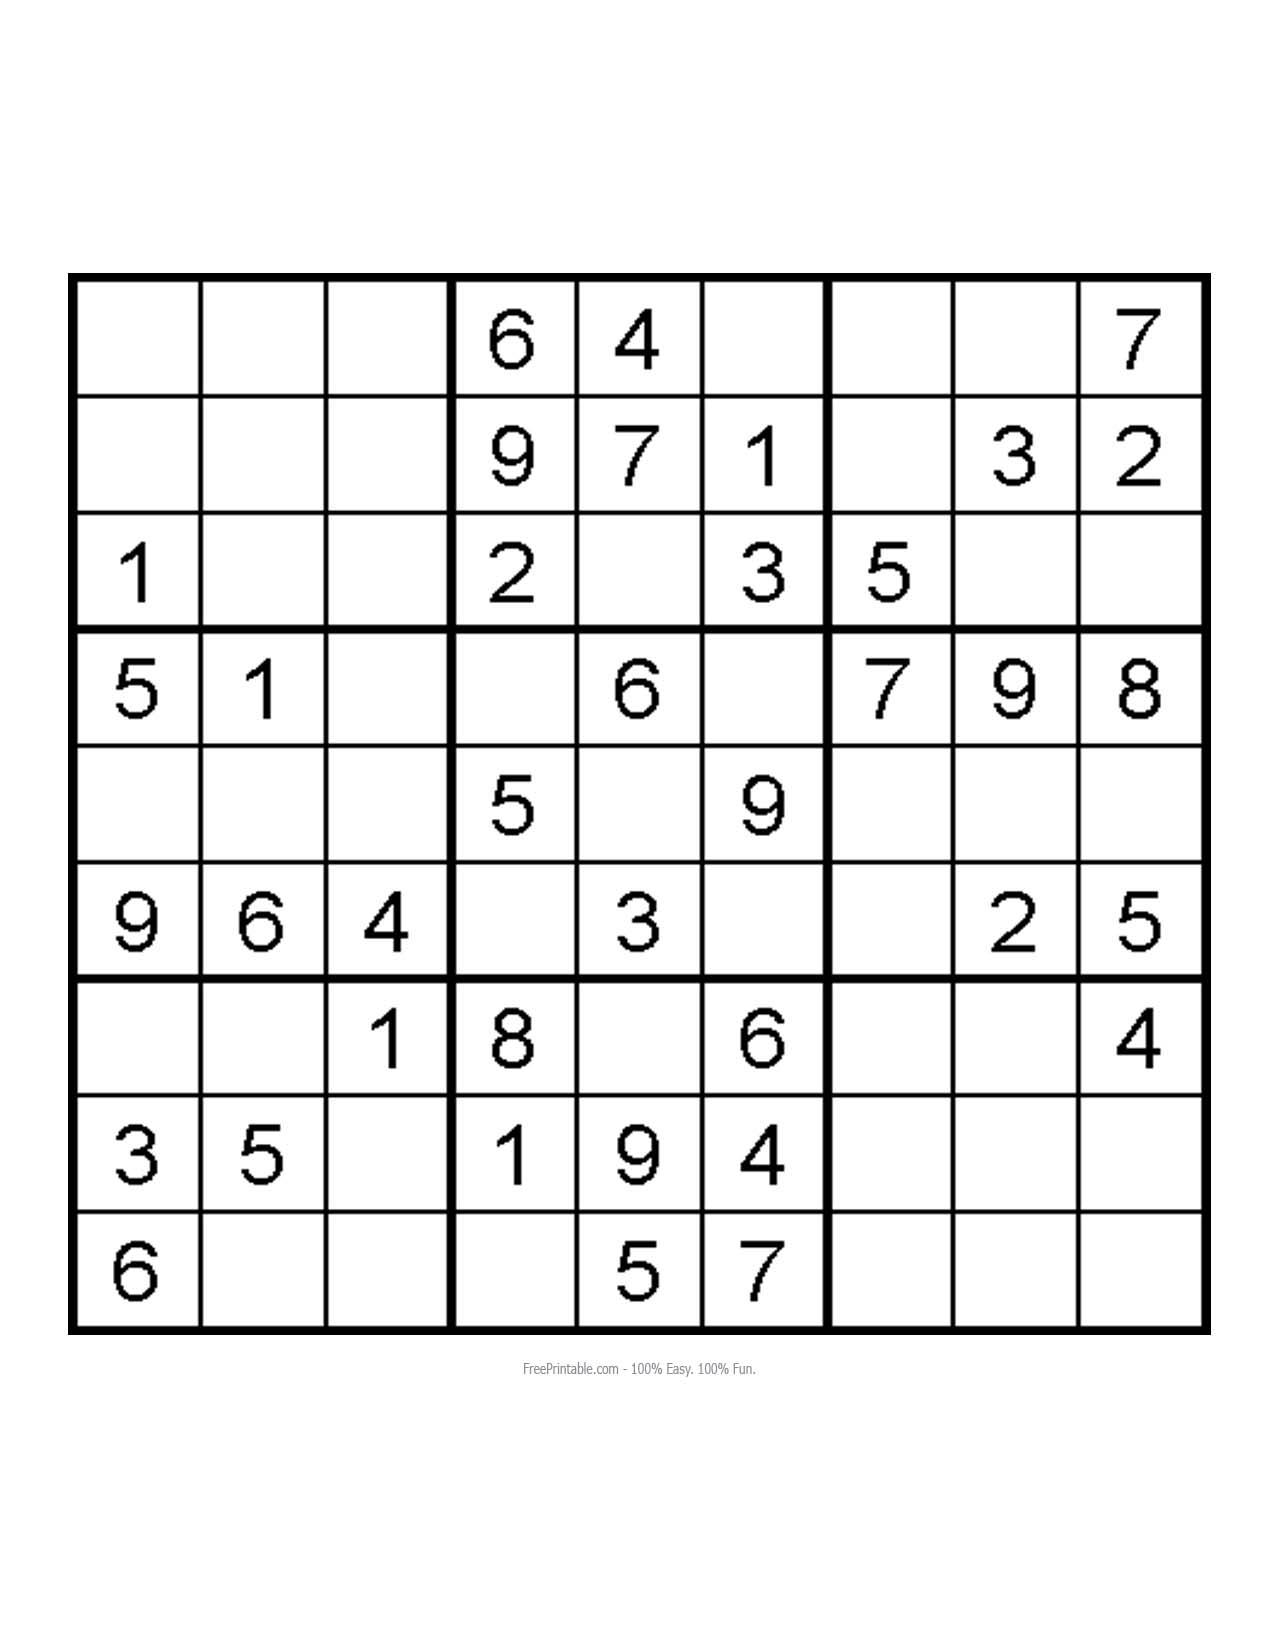 Free Printable Very Easy Sudoku Puzzles